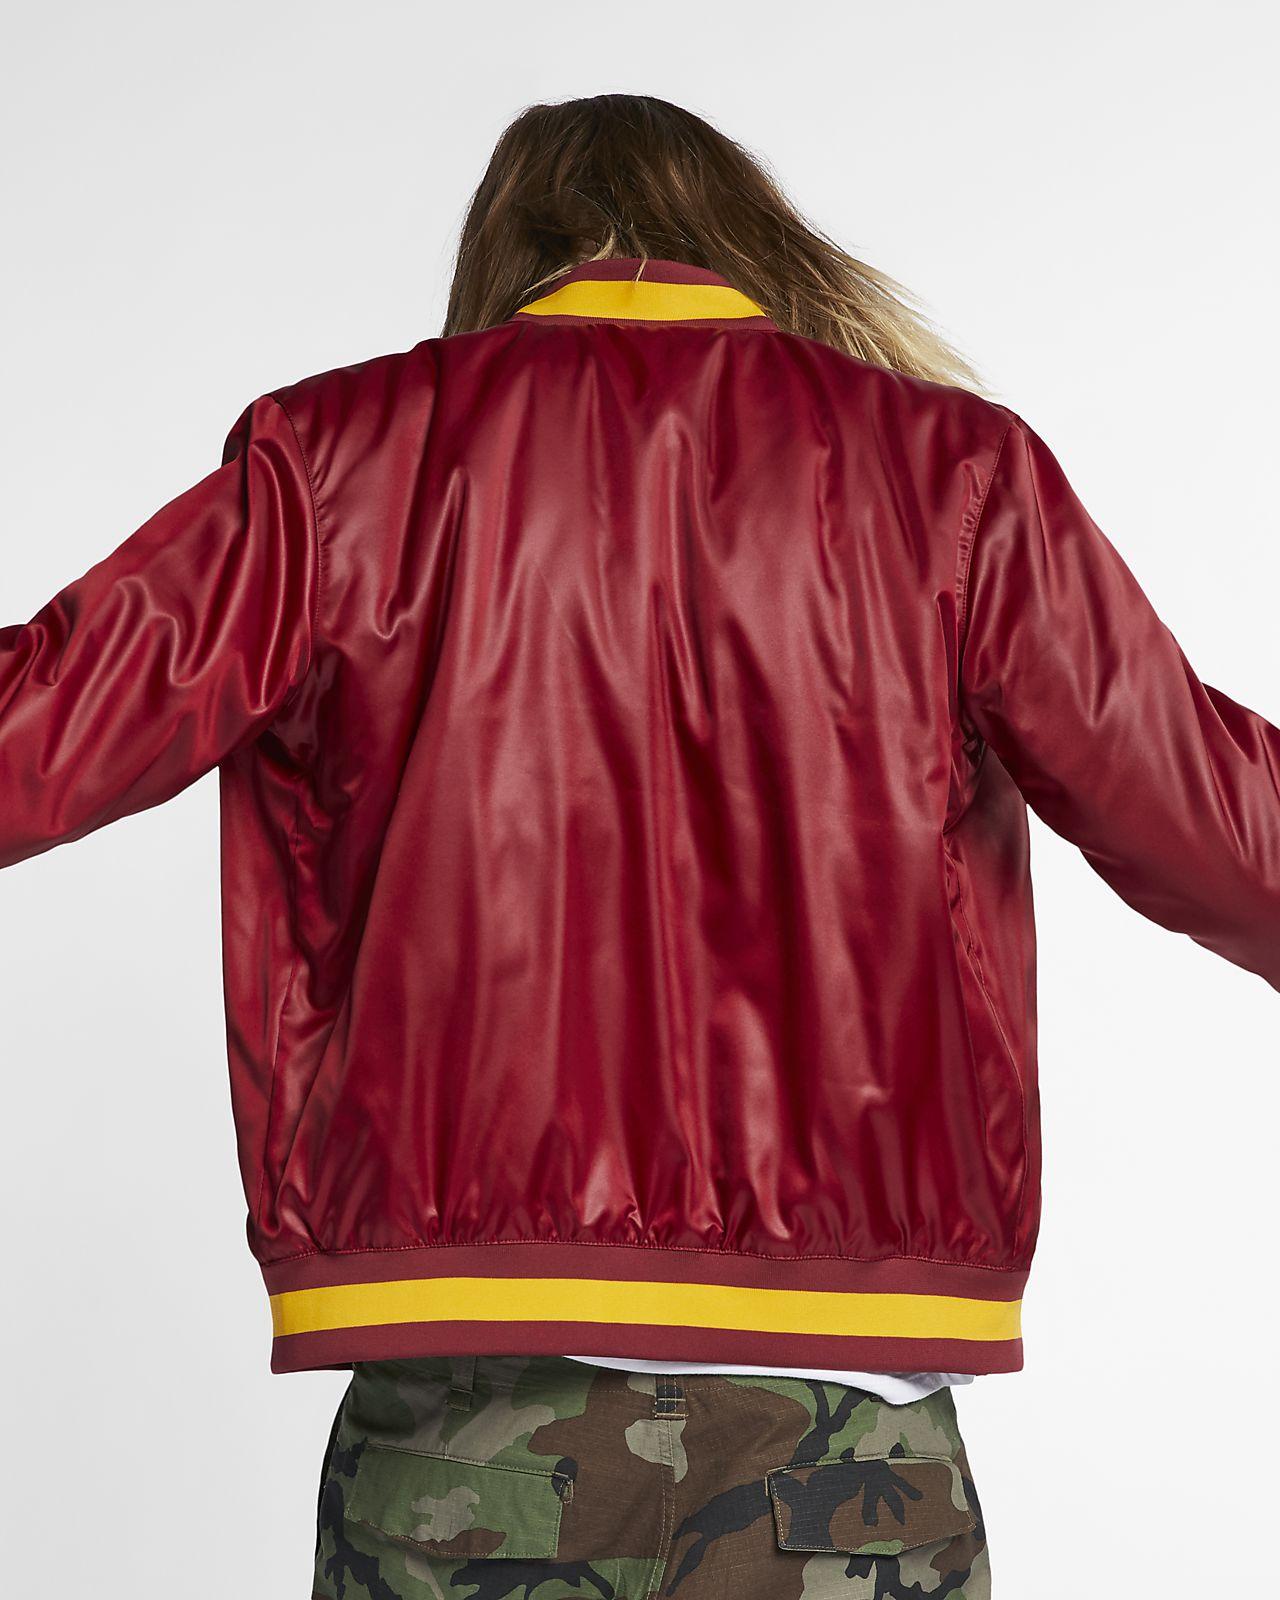 buy online c8f79 78755 ... Nike SB x NBA Men s Skate Bomber Jacket